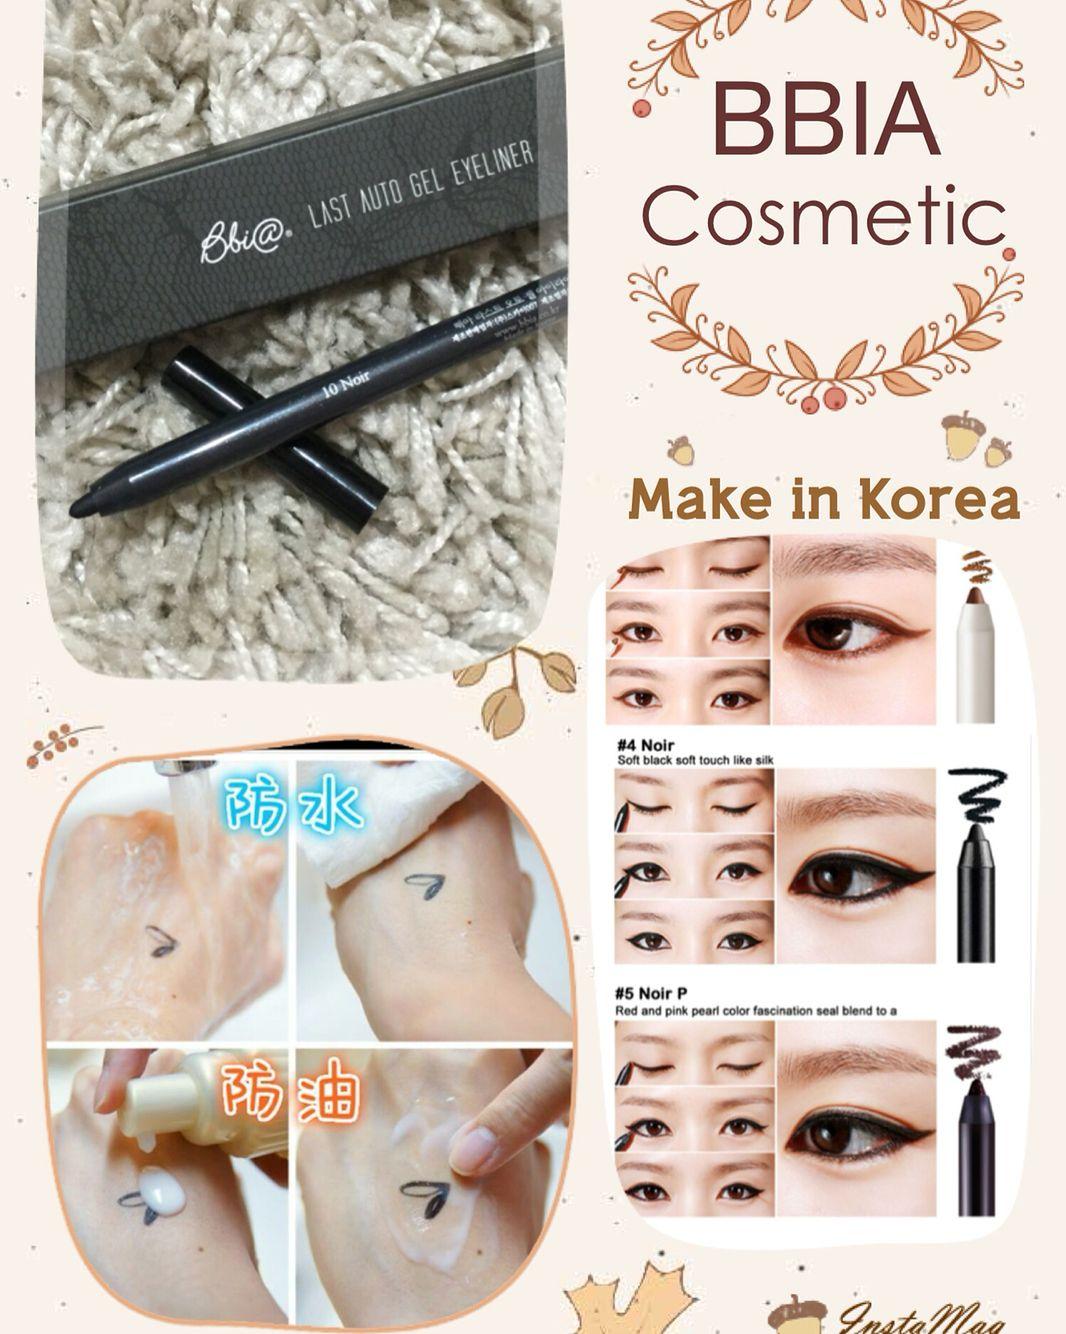 BBIA Last Auto Gel Eyeliner/ Pencil Eyeliner/ Super